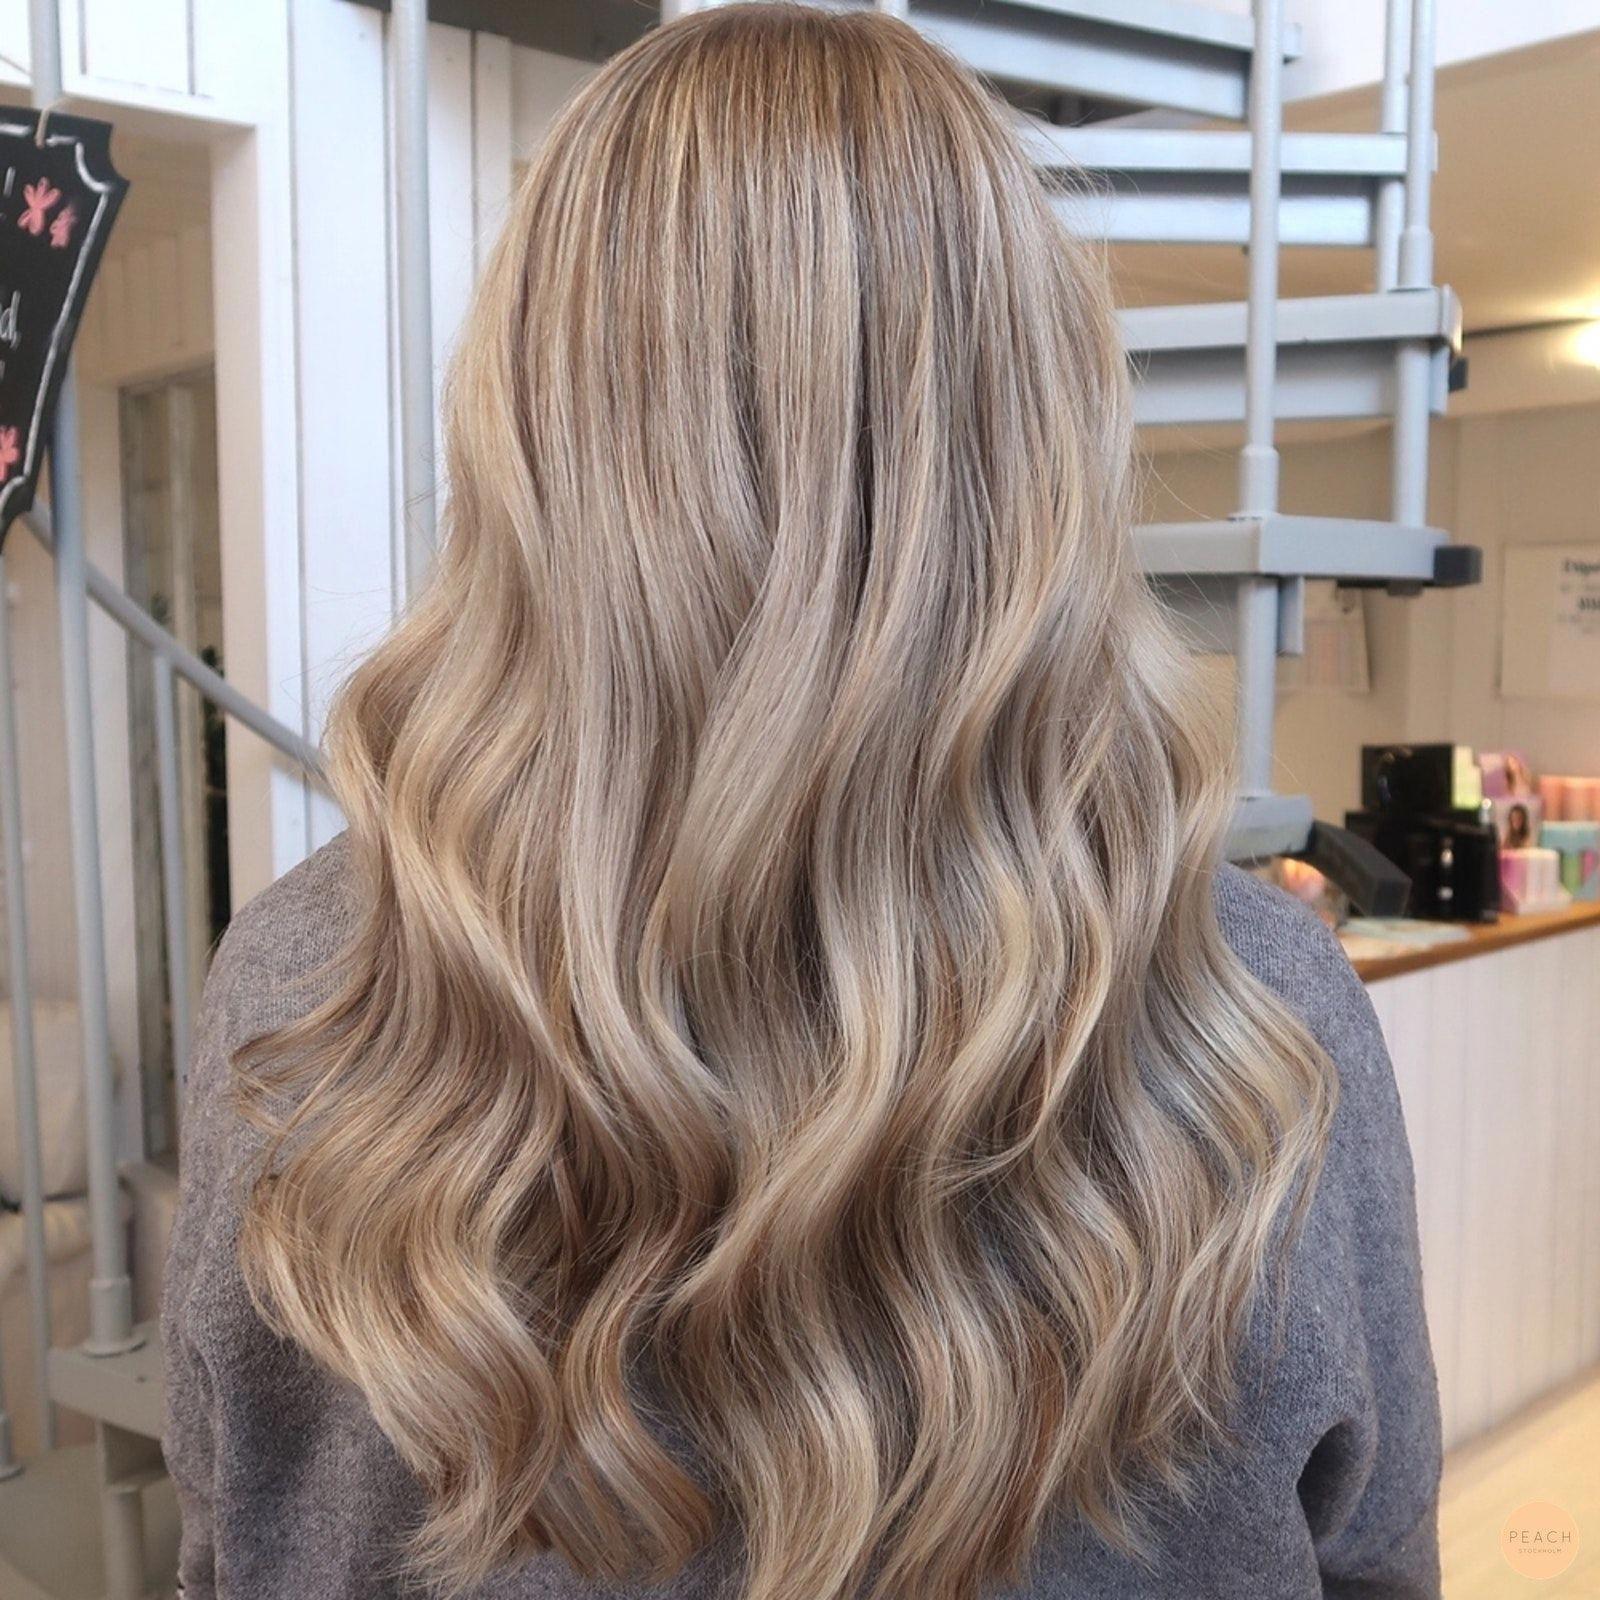 Photo of #hairstyle ideas short bob #bridal hairstyle ideas reception #hairstyle ideas bl…